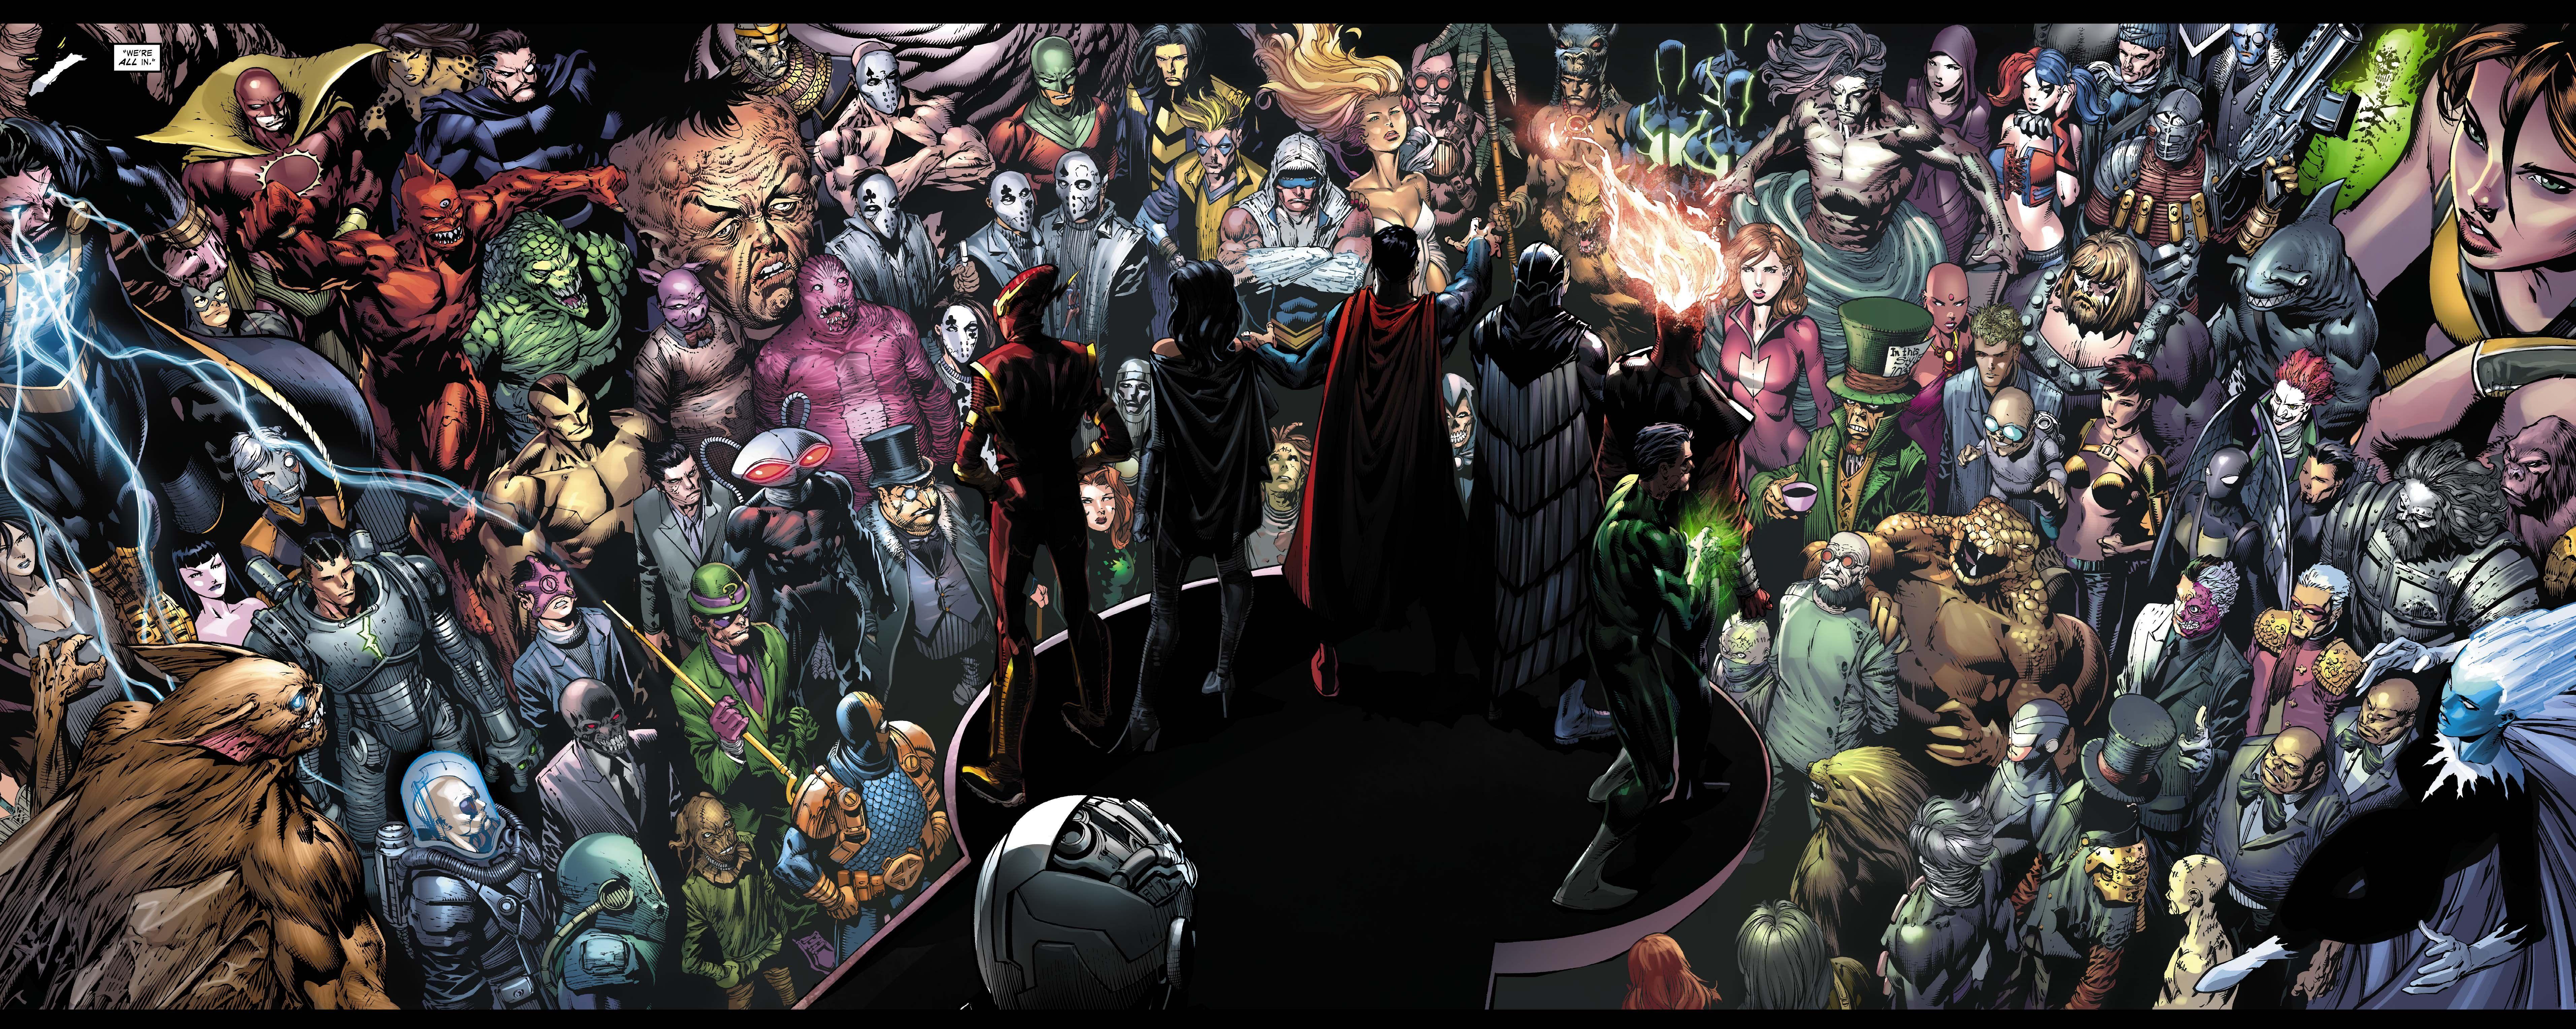 Dc Comics Wallpapers Top Free Dc Comics Backgrounds